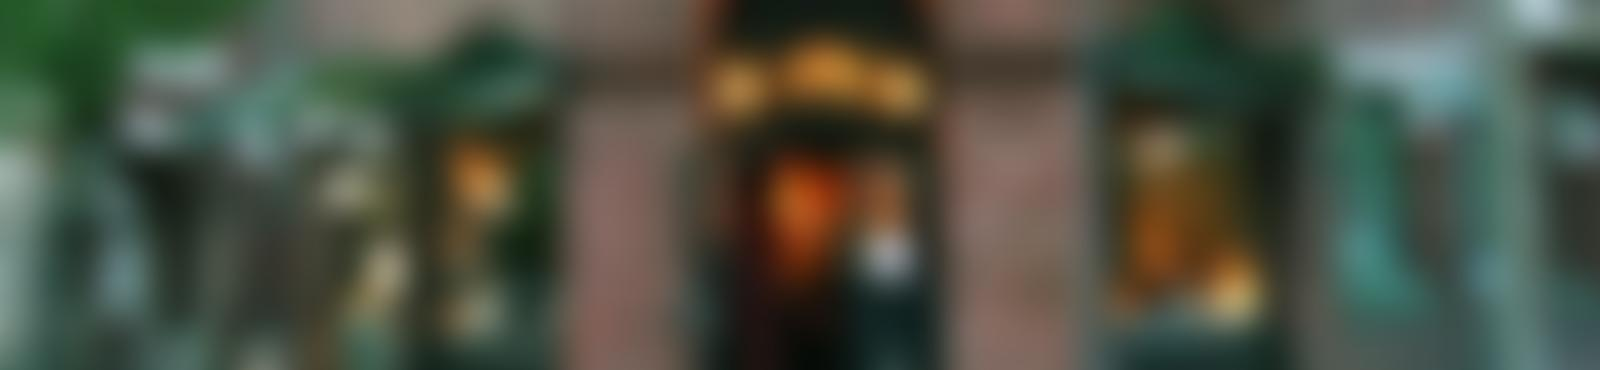 Blurred 68fa503b 3d9e 4a3e 97c5 c98bc9332c84